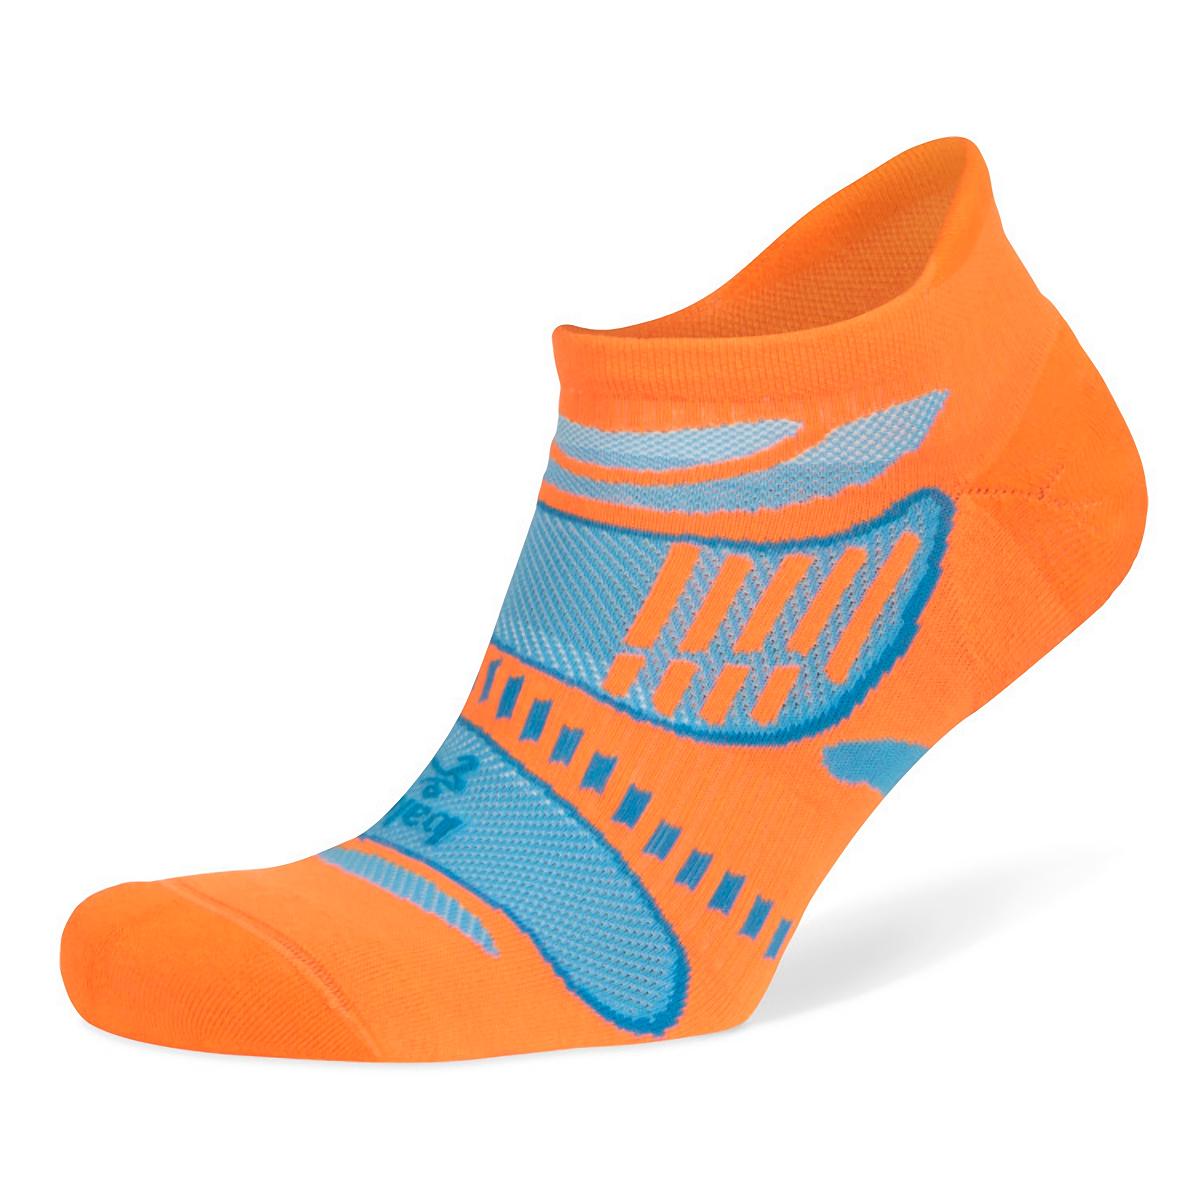 Balega Ultra Light No Show Tab Socks - Color: Flu Orange - Size: S, Flu Orange, large, image 3